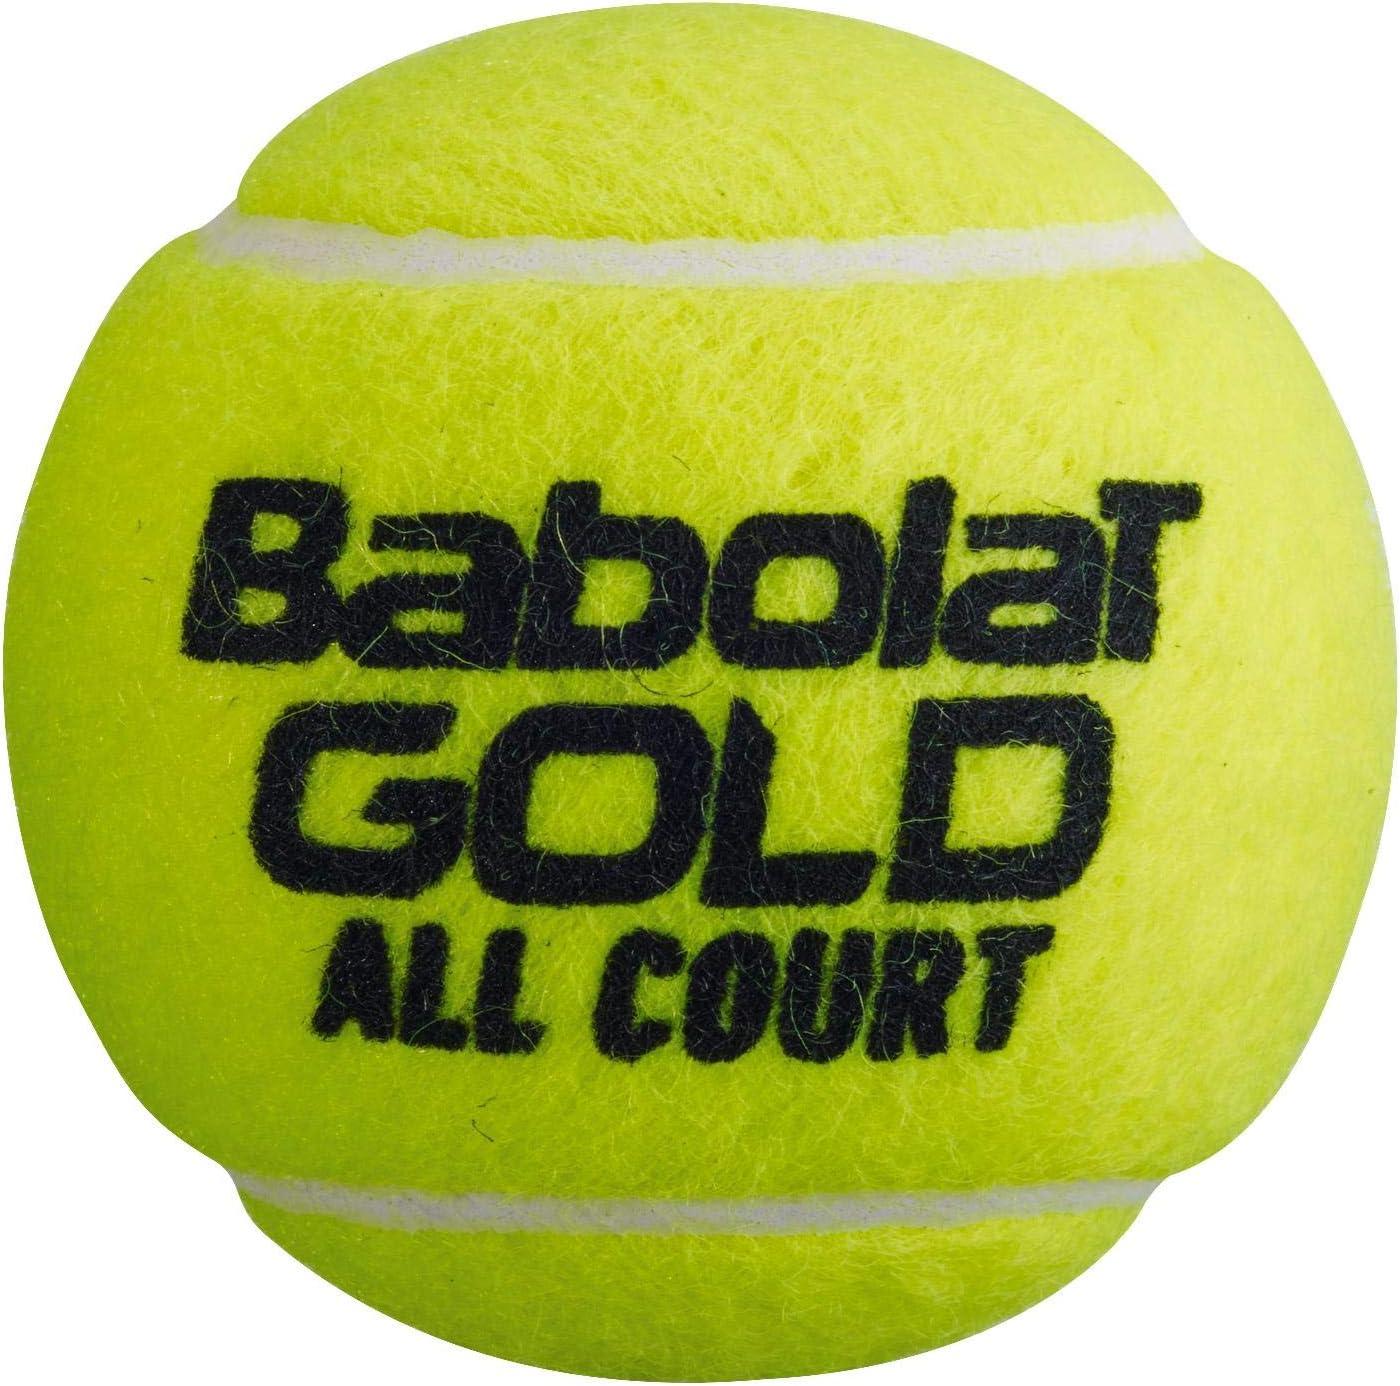 2x 3 Ball Tube BRAND NEW /& SEALED Babolat First ITF Durable Tennis Balls